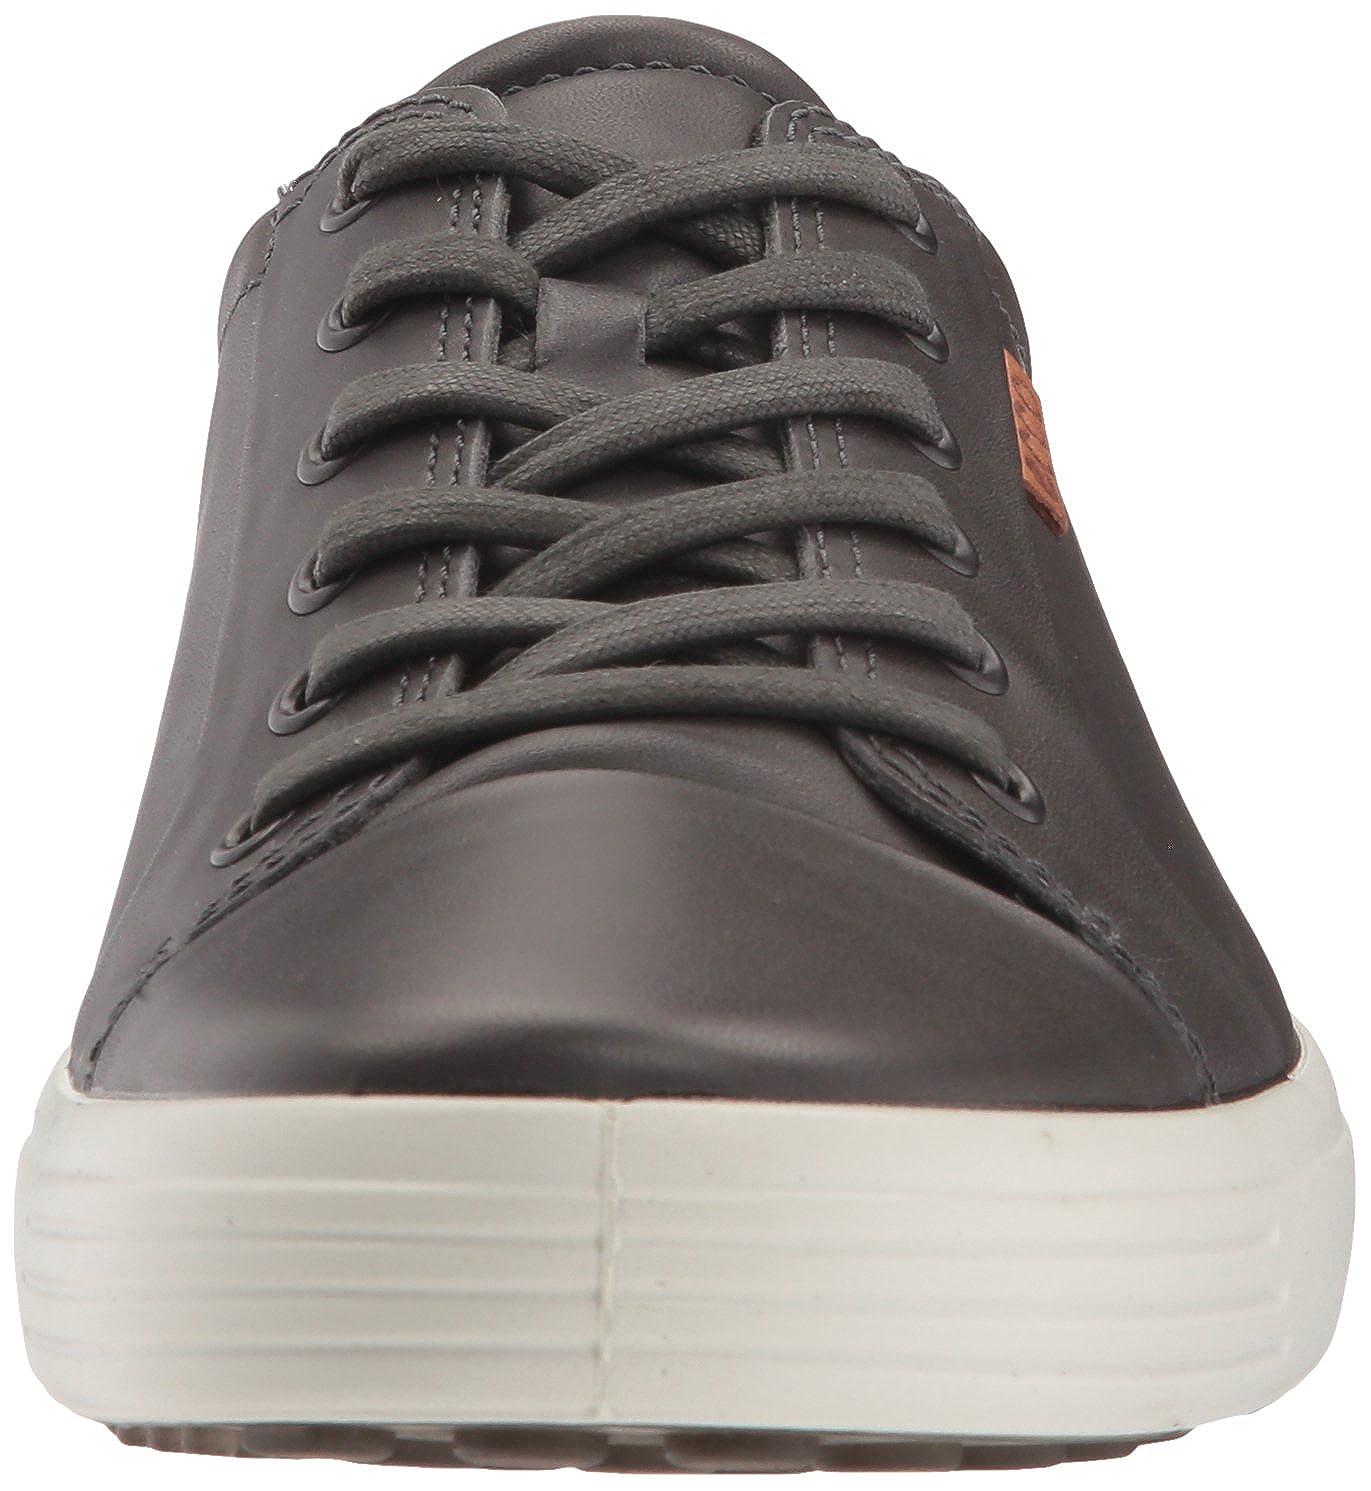 ECCO Men's Soft 7 Tie Sneaker, Magnet, 47 M EU (13 13.5 US